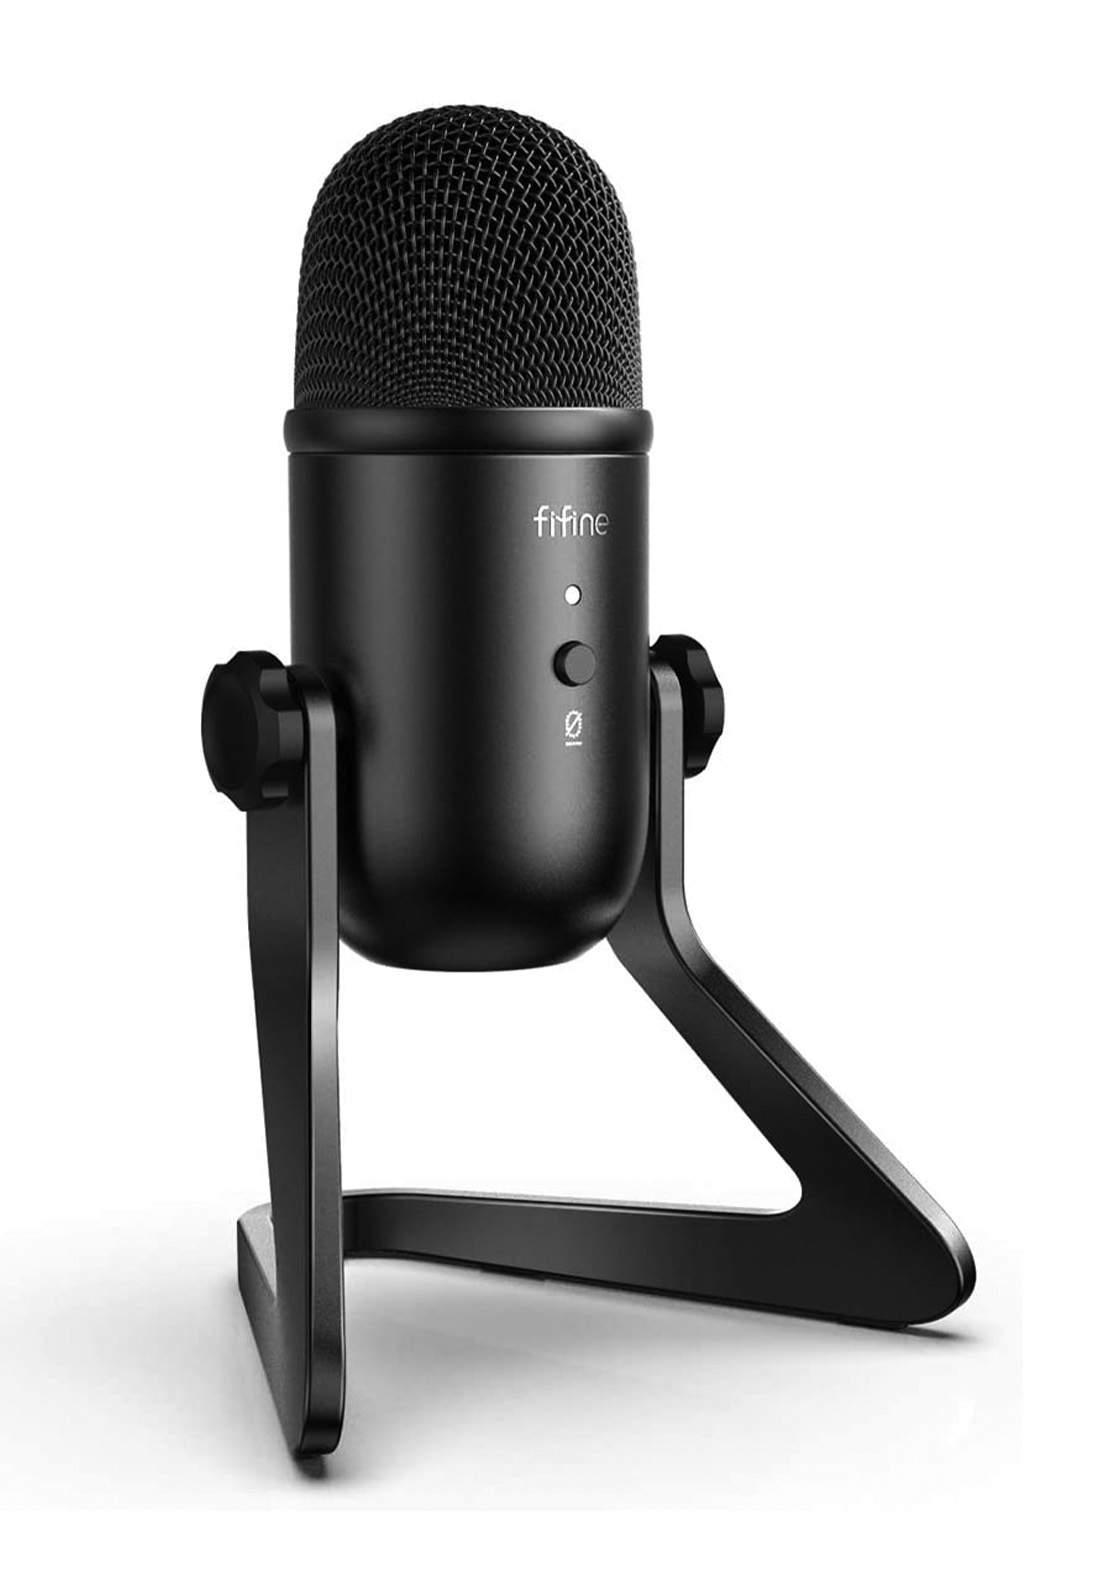 Fifine K678 USB Microphone for PC Recording - Black مايكرفون